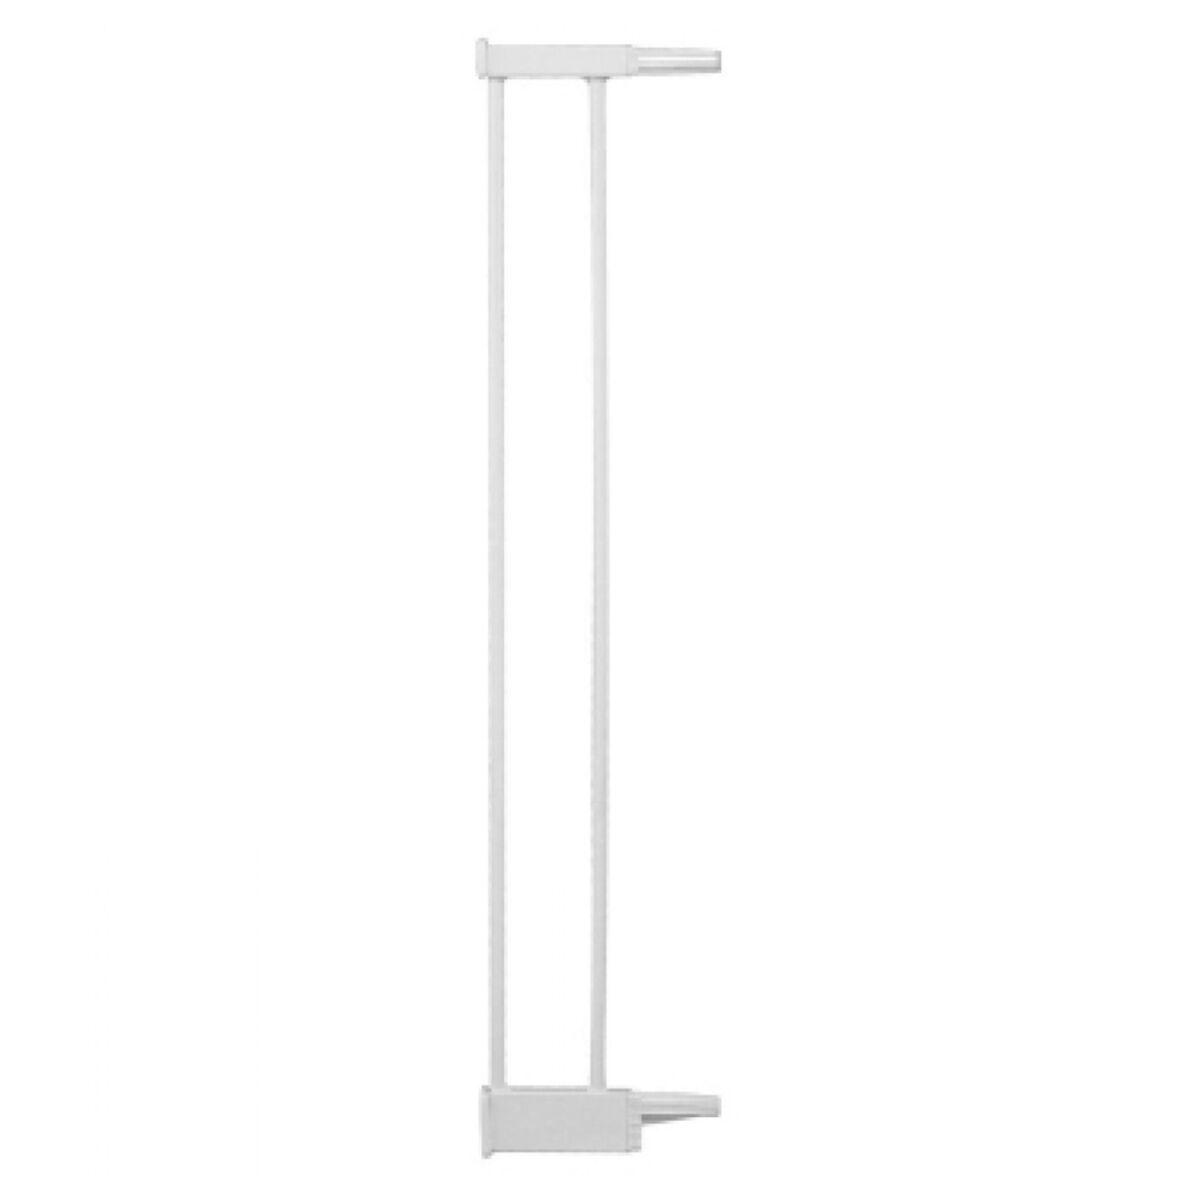 Quax Rallonge 12,4 cm - Blanc